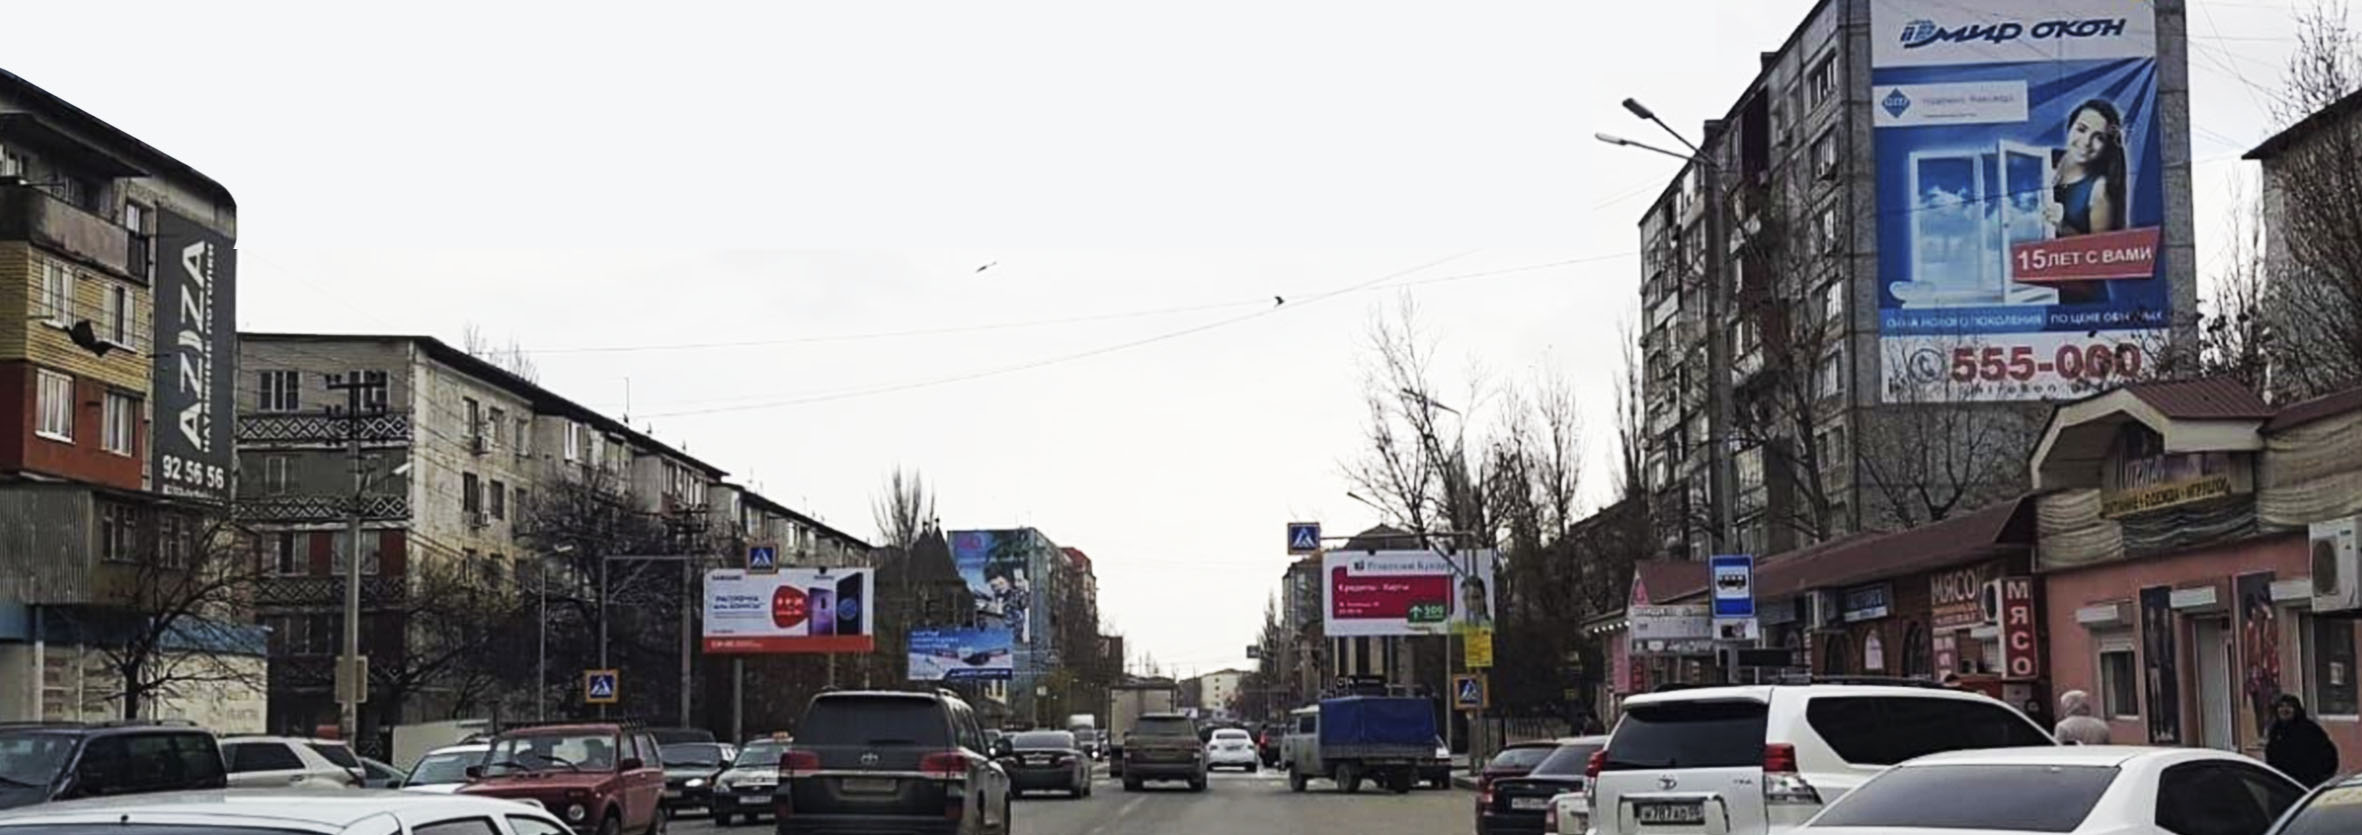 Реклама на брандмауэрах в Махачкале Дагестан